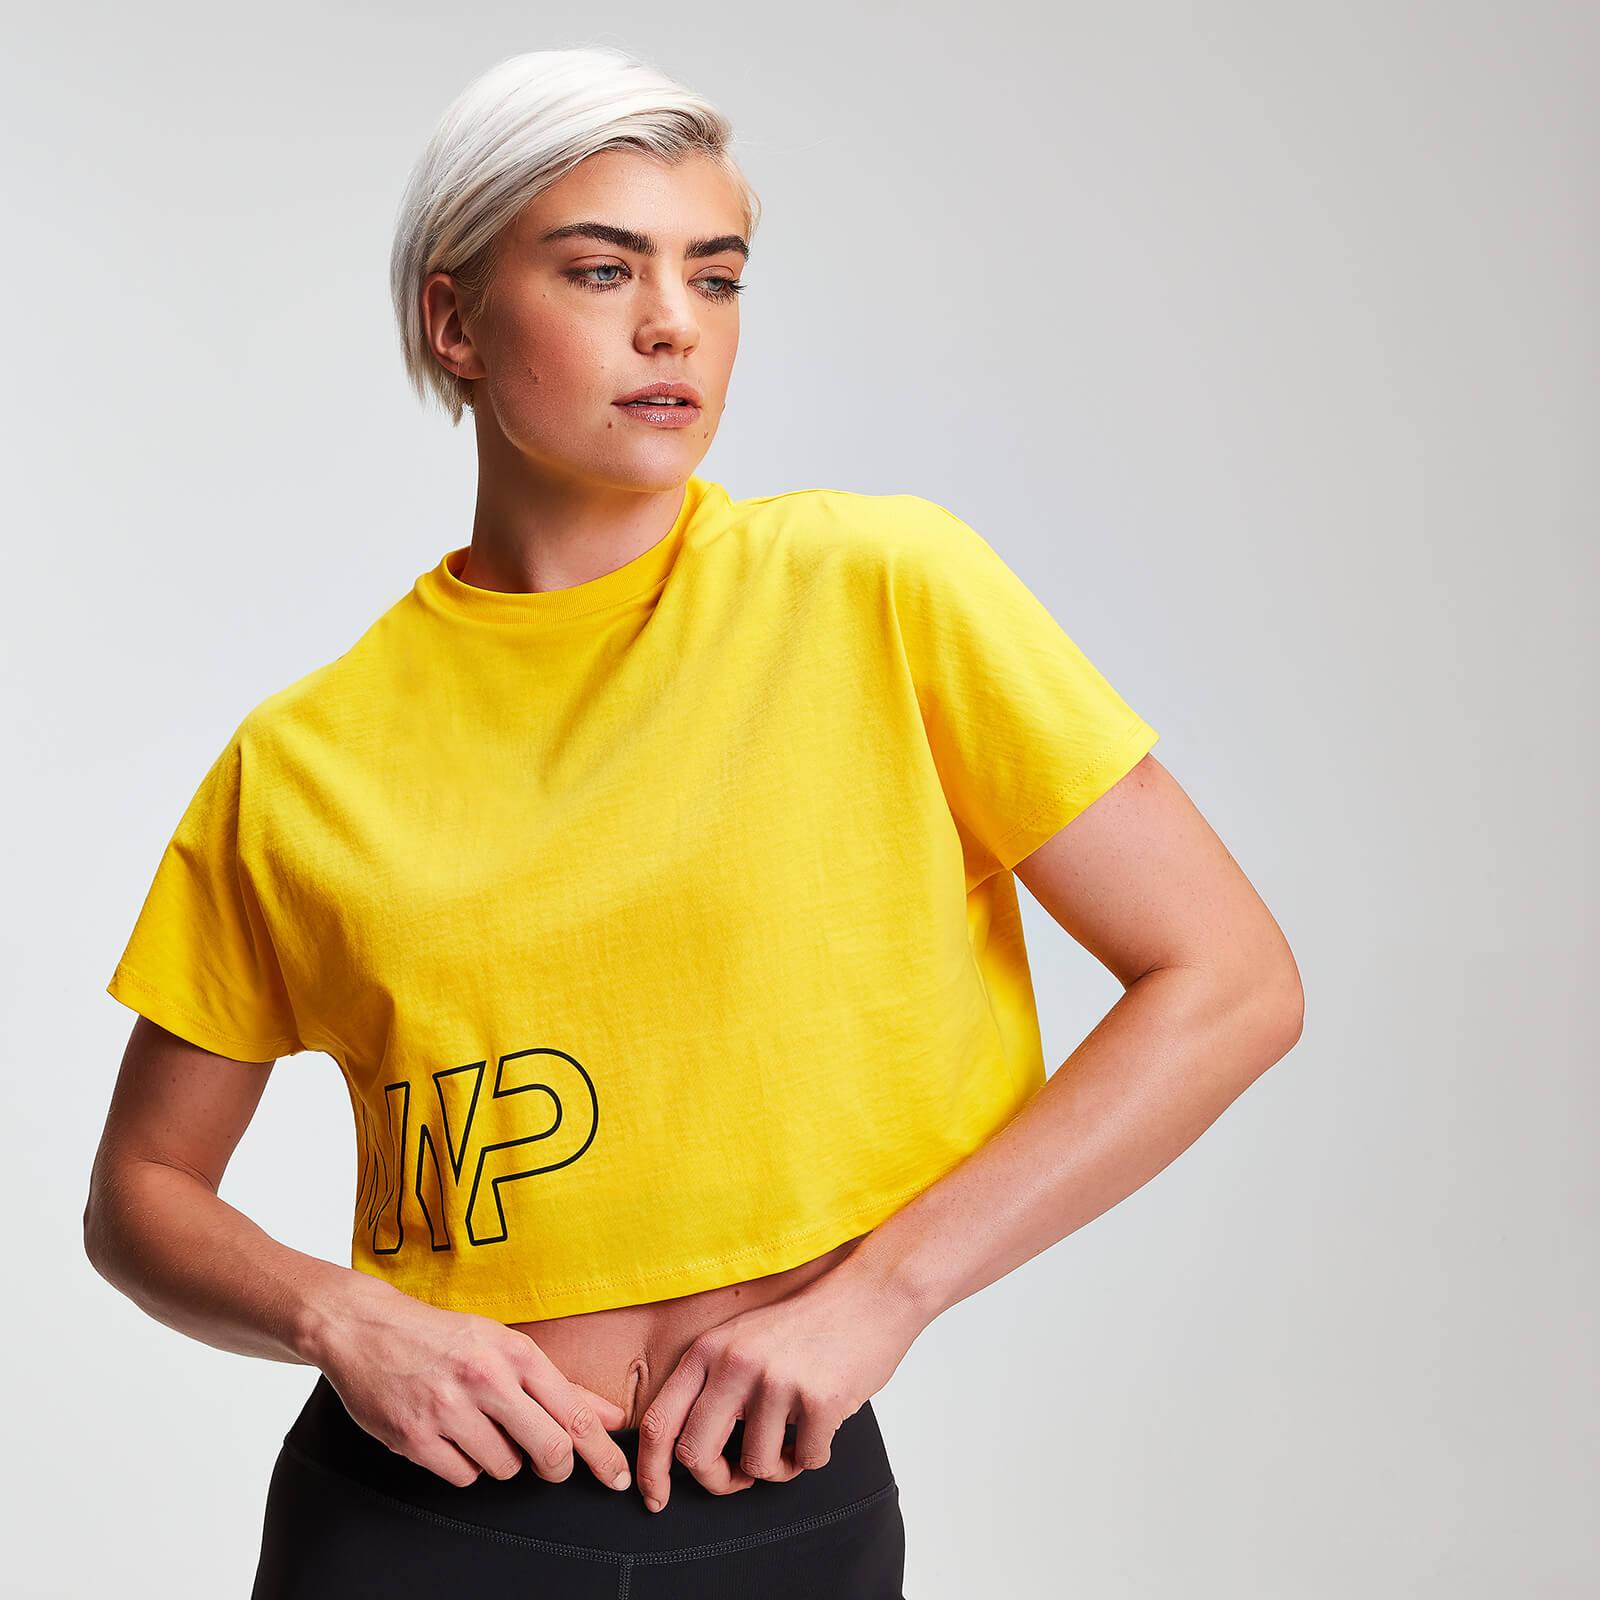 Myprotein Naisten MP Power Cropped T-Paita - Buttercup - XS